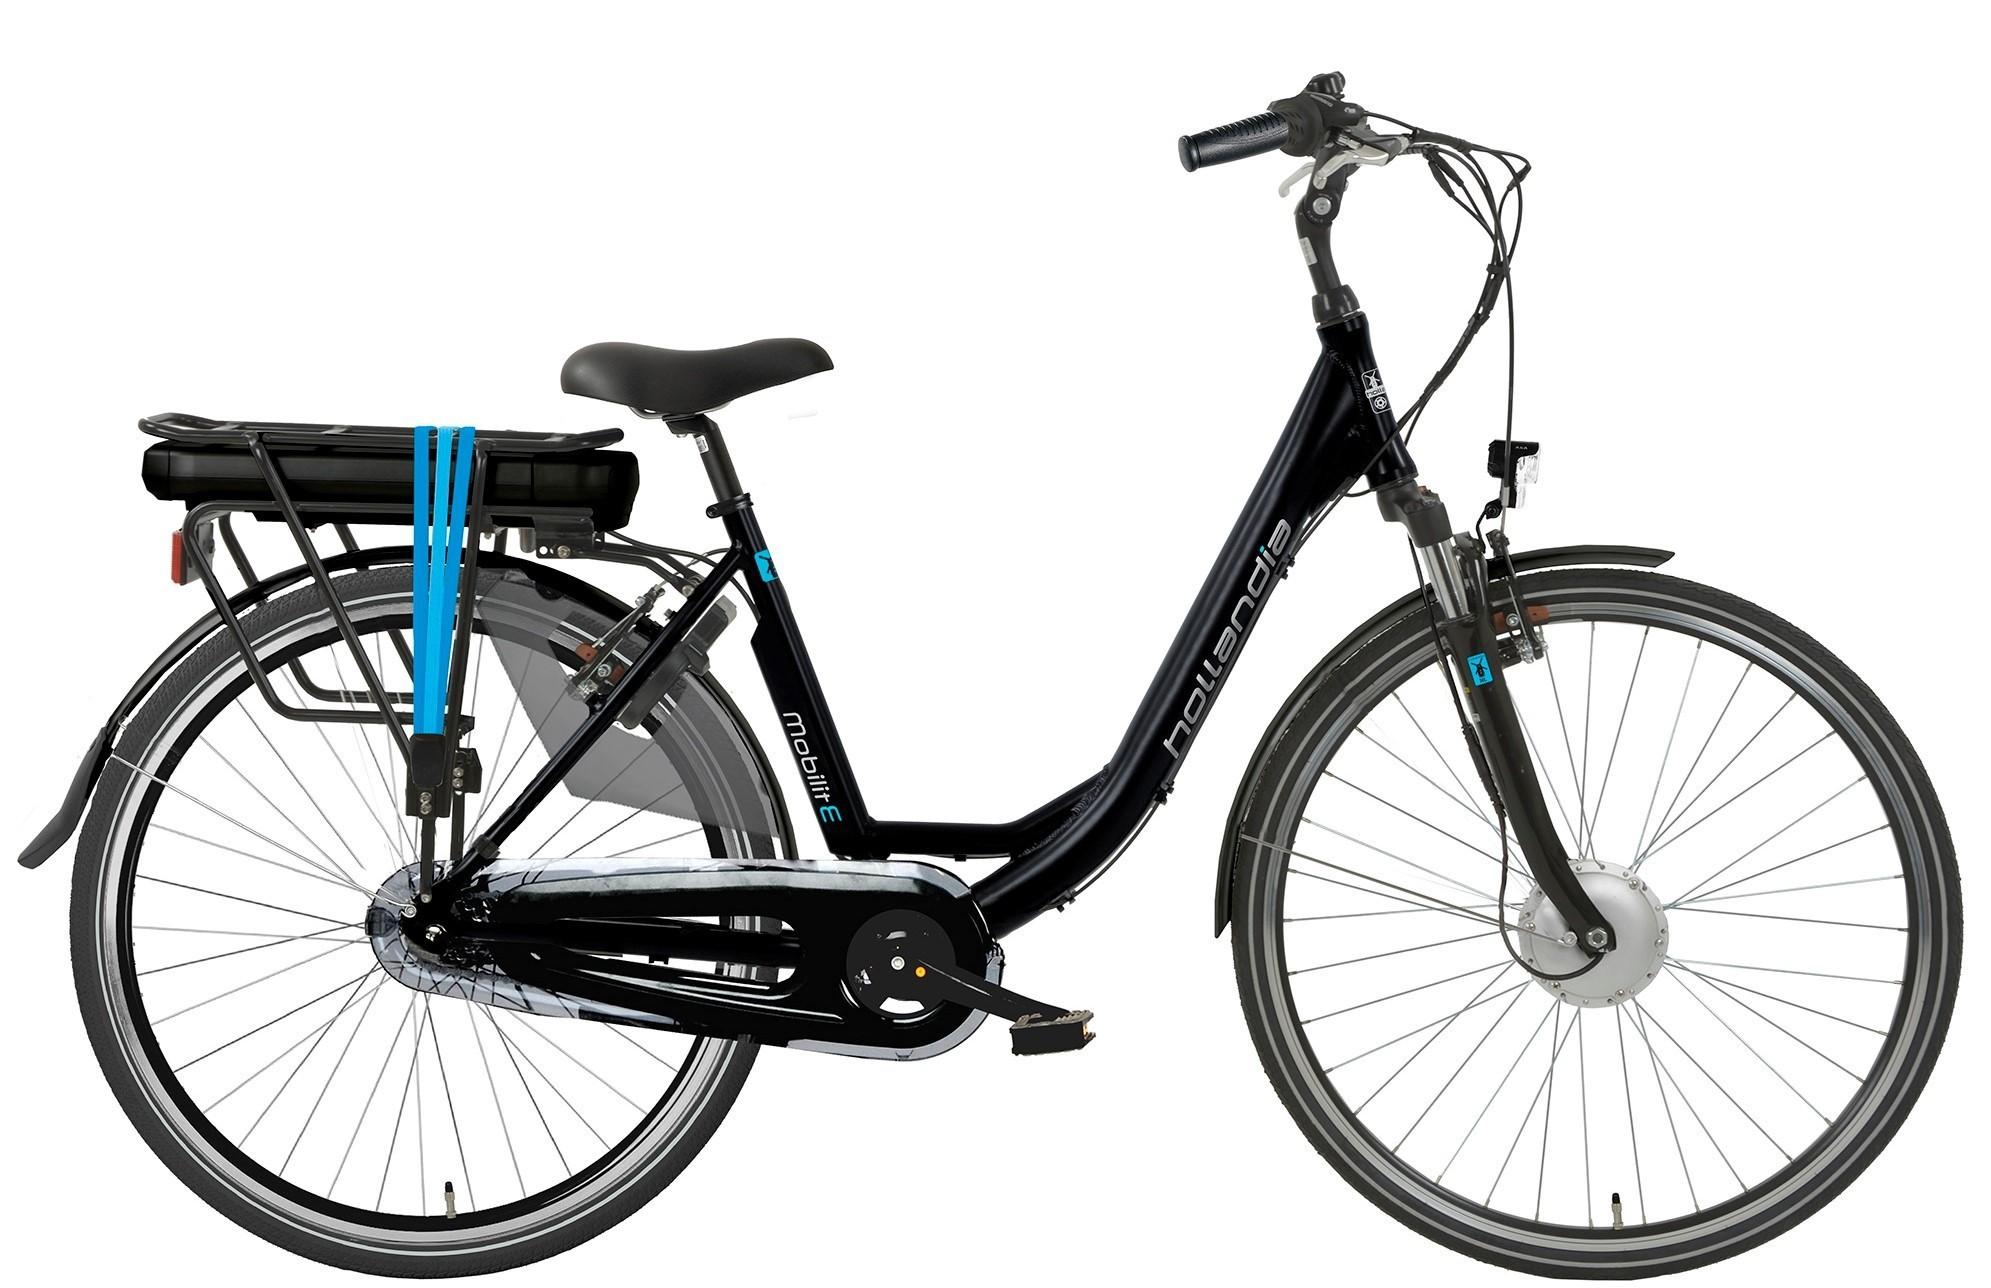 Hollandia Mobilit E-bike 7V met voorwielmotor